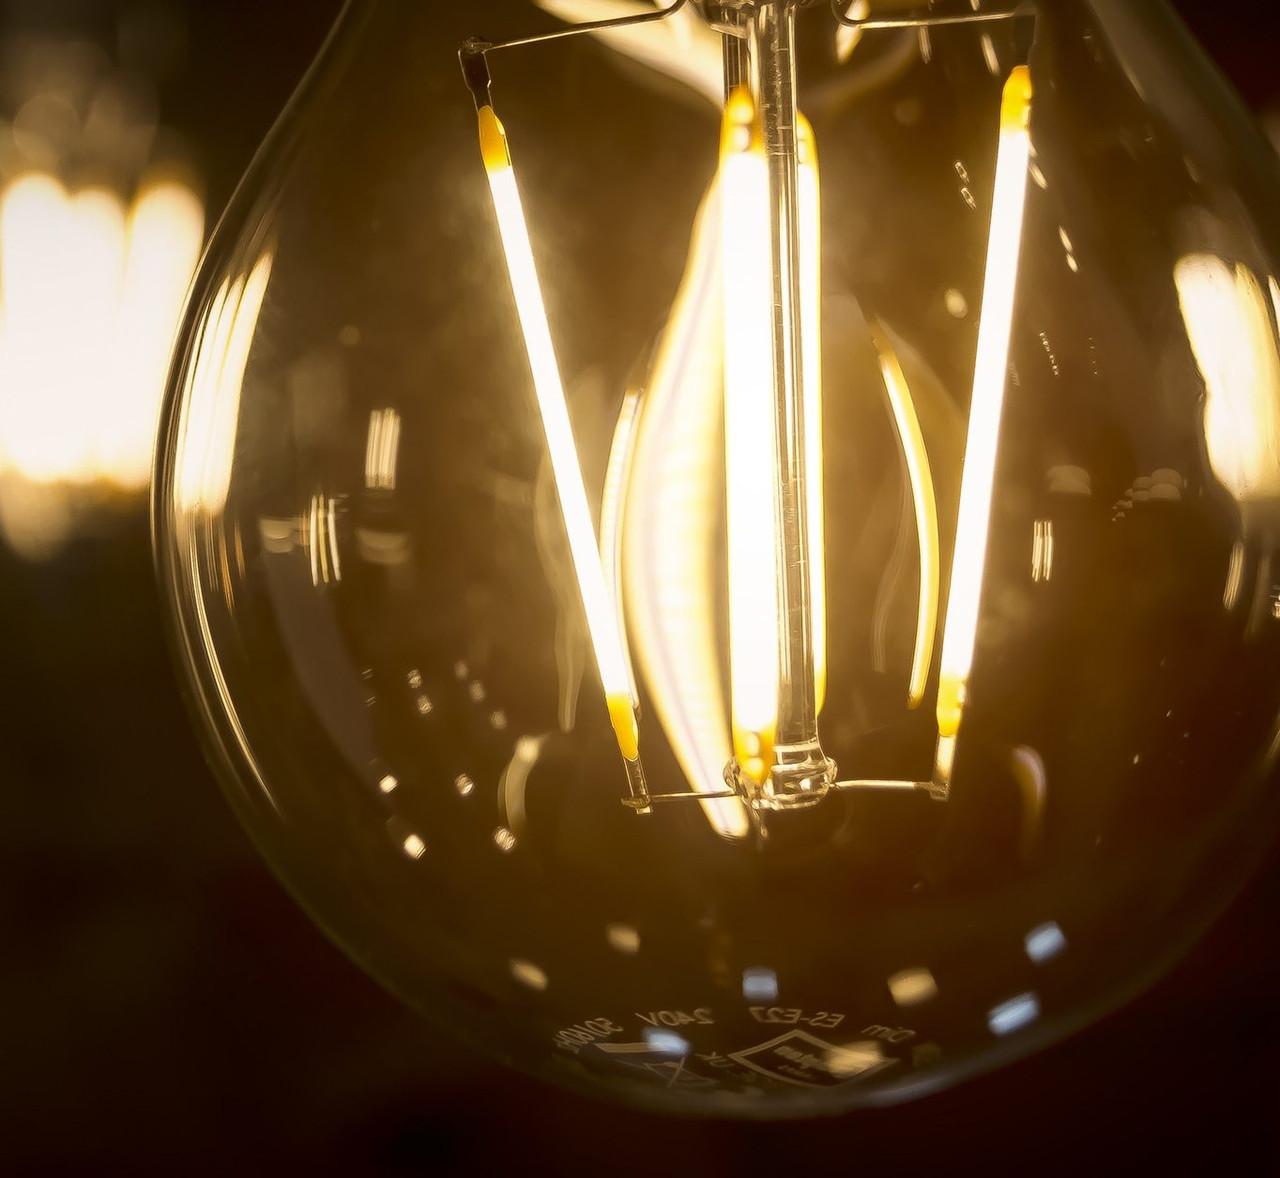 LED GLS 60W Equivalent Light Bulbs